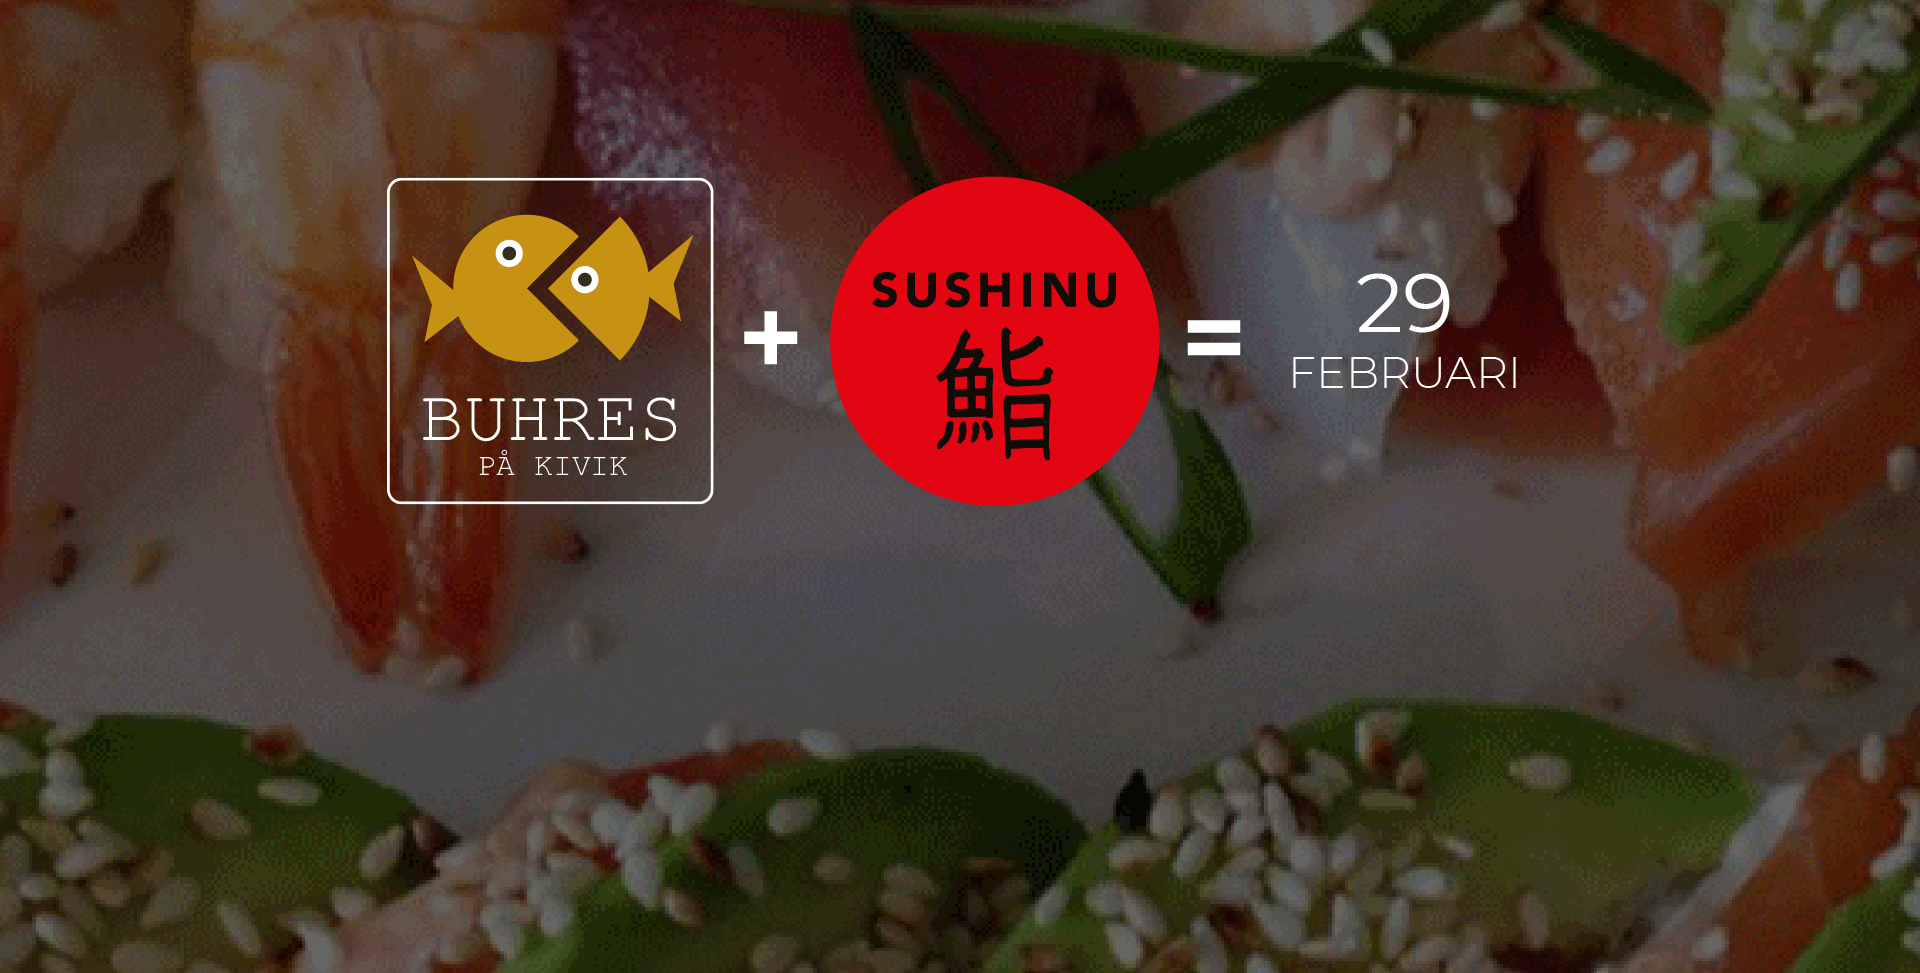 Sushinu + Buhres 29 Februari